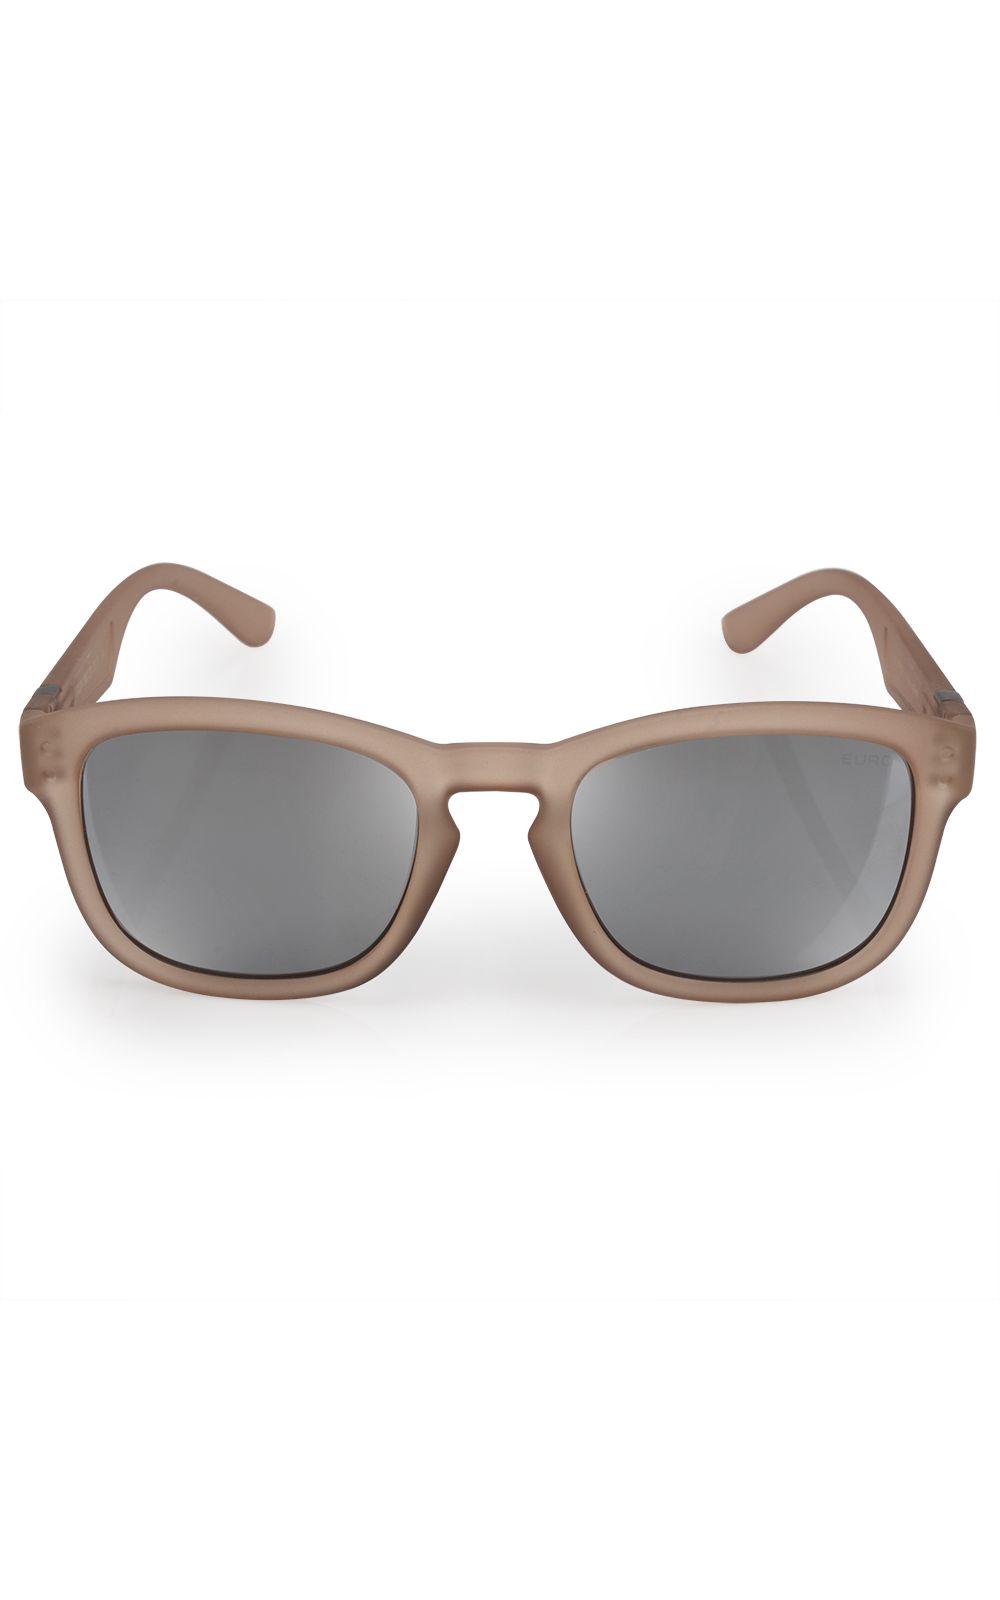 Foto 1 - Óculos Euro Feminino Redondo Fashion Nude E0024B6309/8X